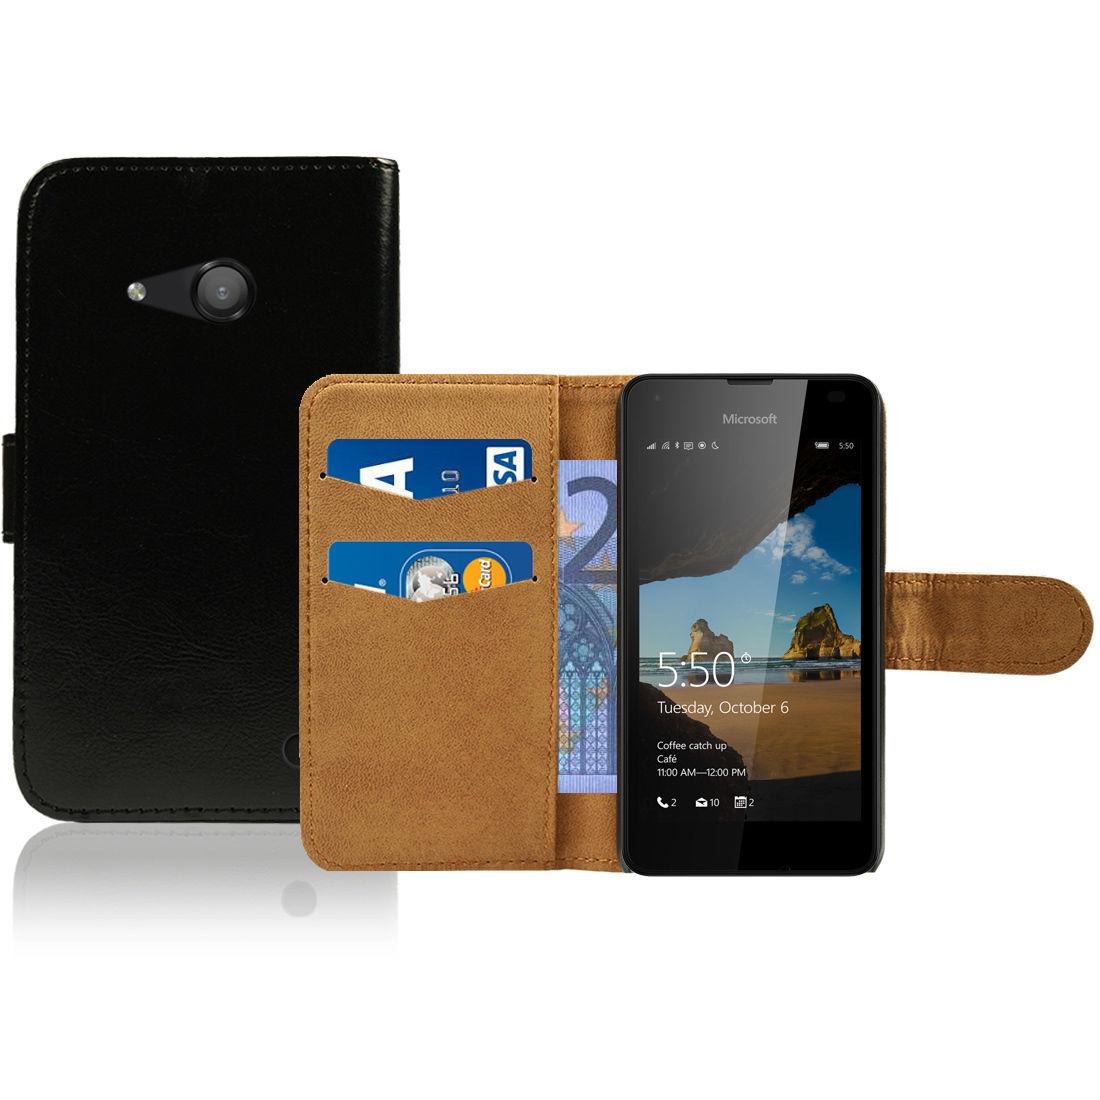 Pouzdro FLIP pro Microsoft Lumia 550 černé